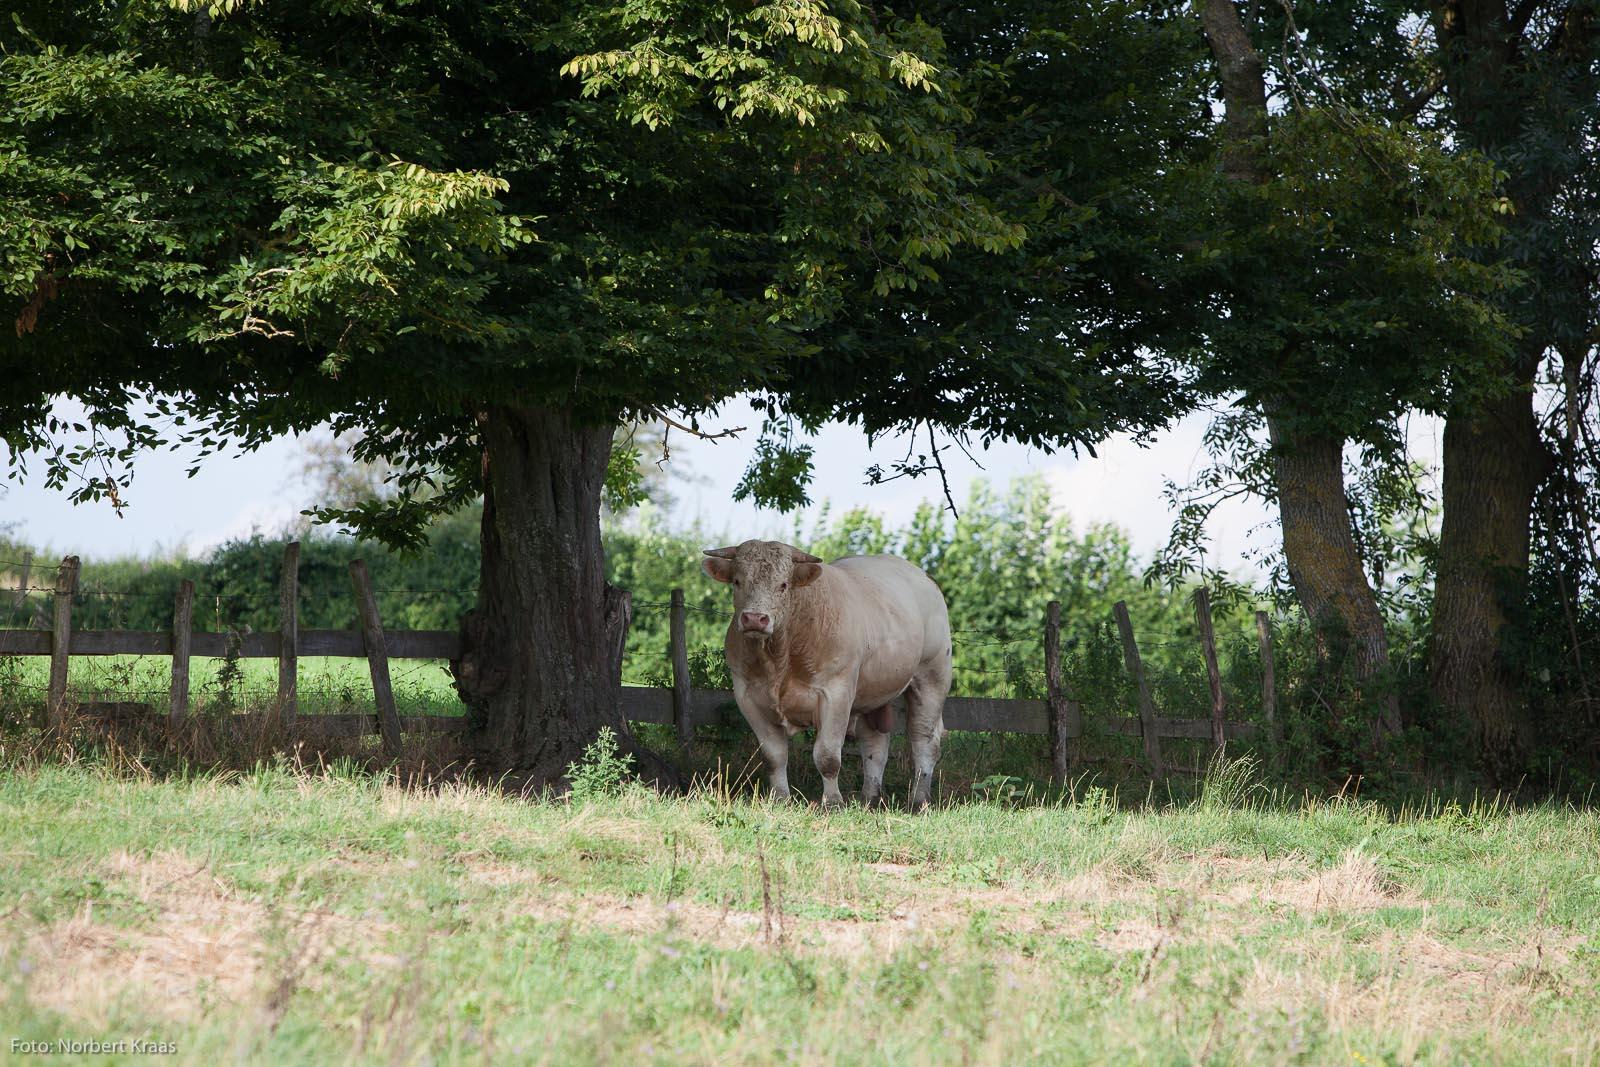 Taureau en Bourgogne en regardant un photographe allemand. Foto: Norbert Kraas